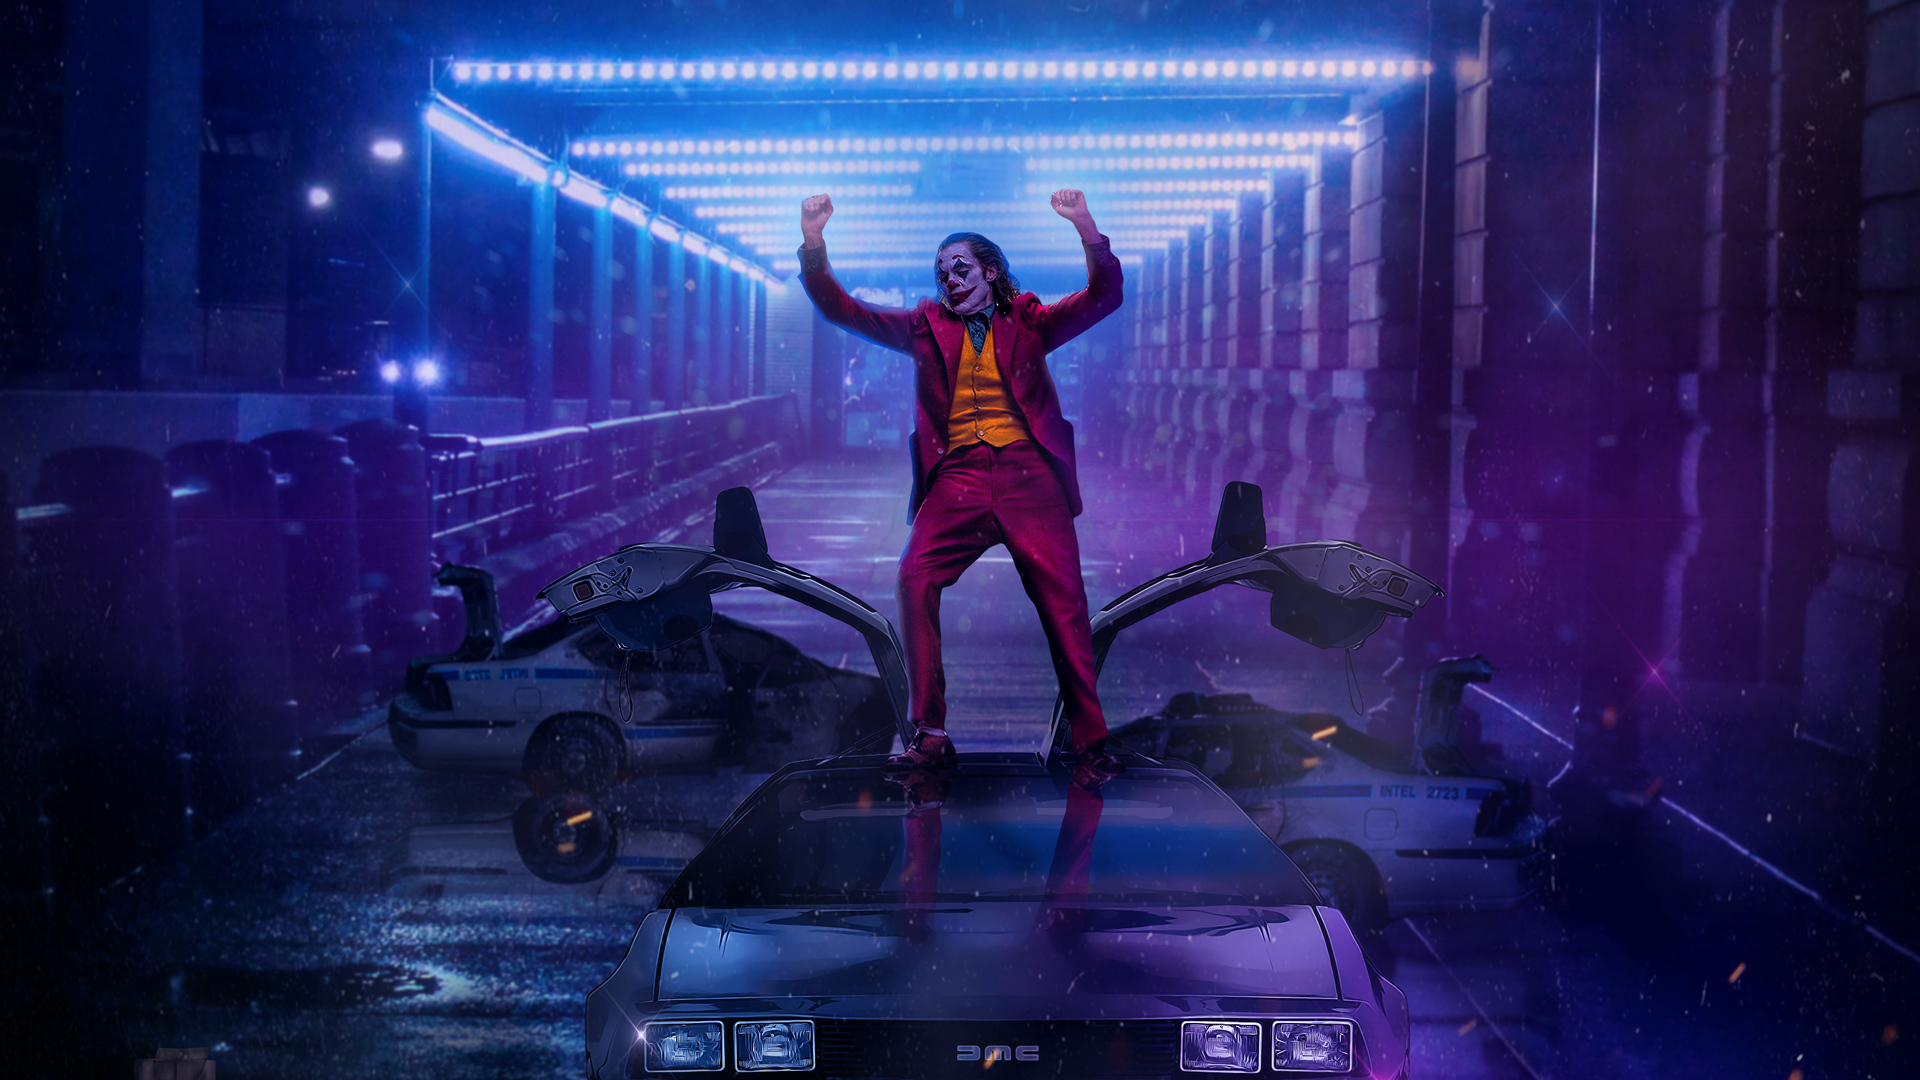 Joker Dancing On DMC DeLorean HD Wallpaper